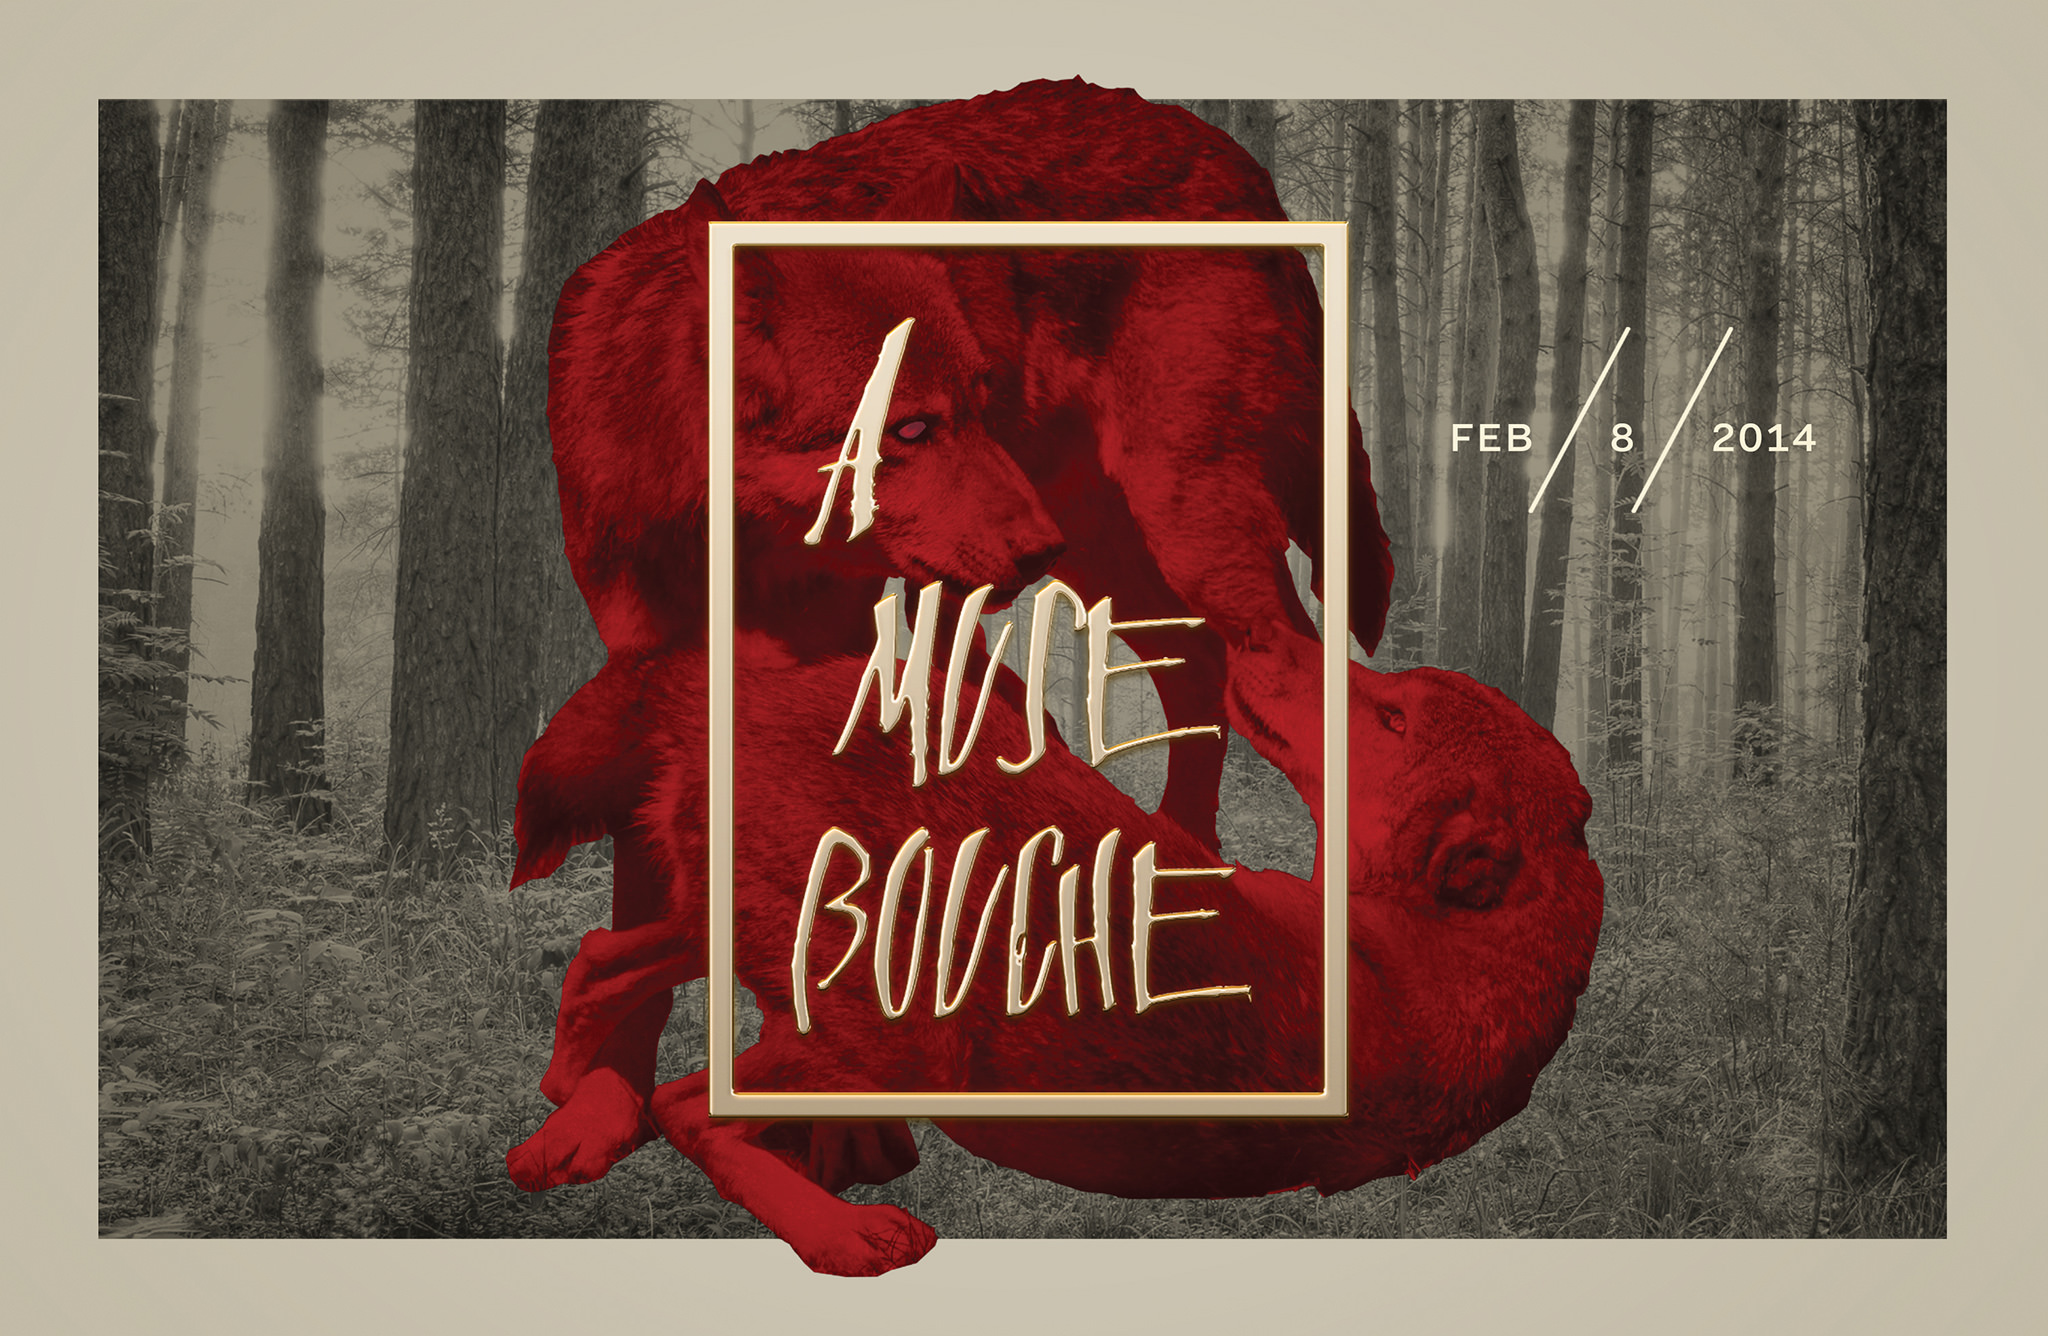 AMuseBouche_Print_Wide_8.5x5.5_Front.jpg